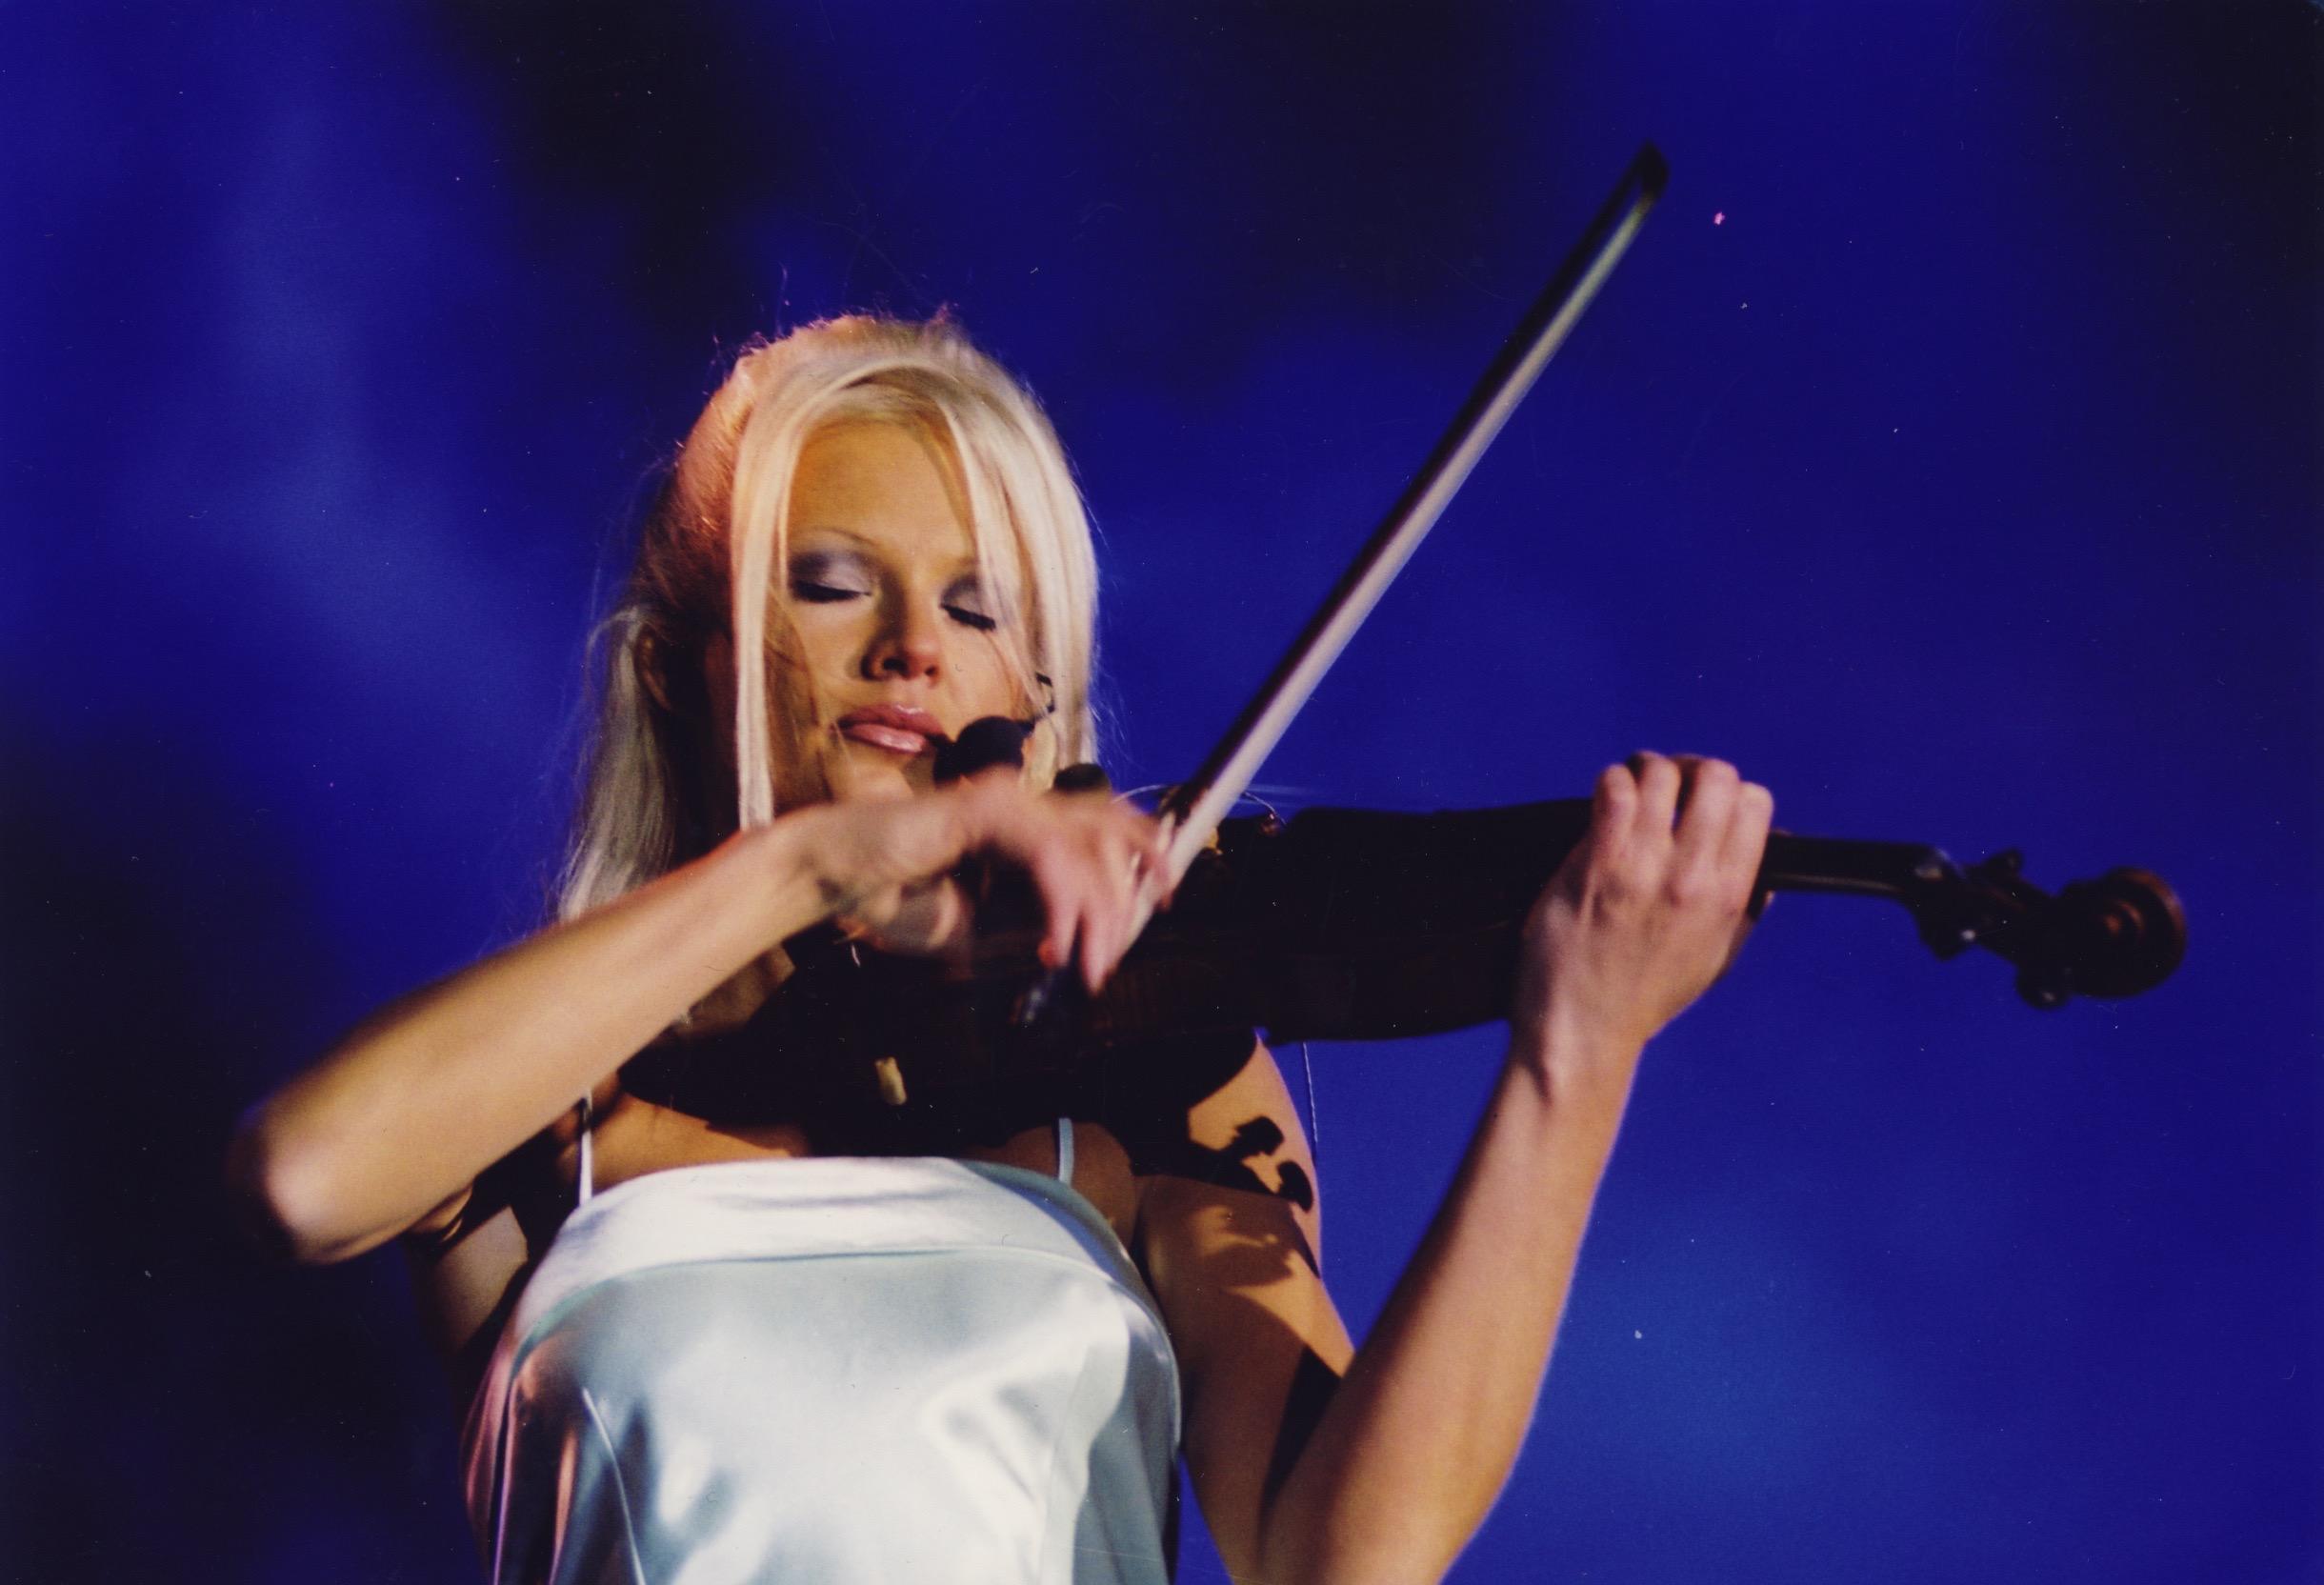 X Factor-27-kuva Ari Soini -97